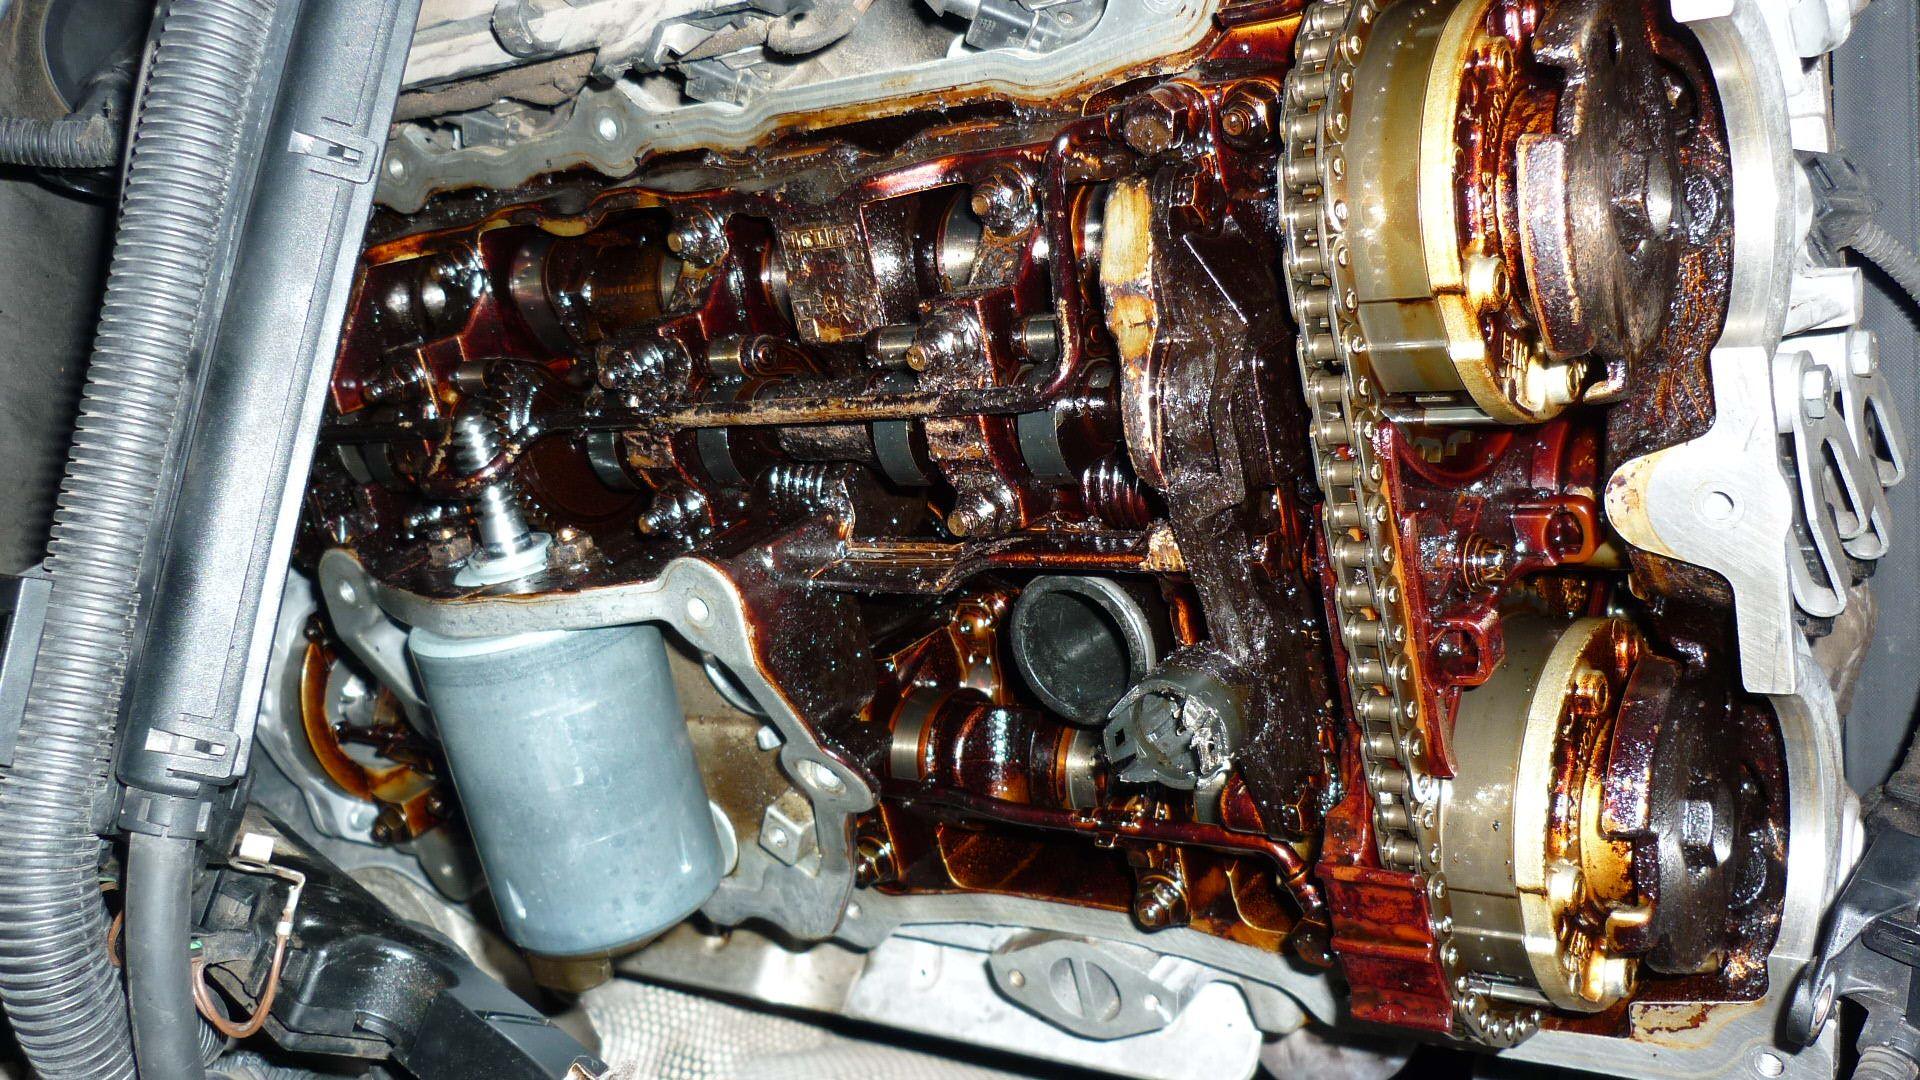 Protec Engine Flush   Internal Motor Cleaner   Remove Contaminates    Engineering, Vehicle care, Flush